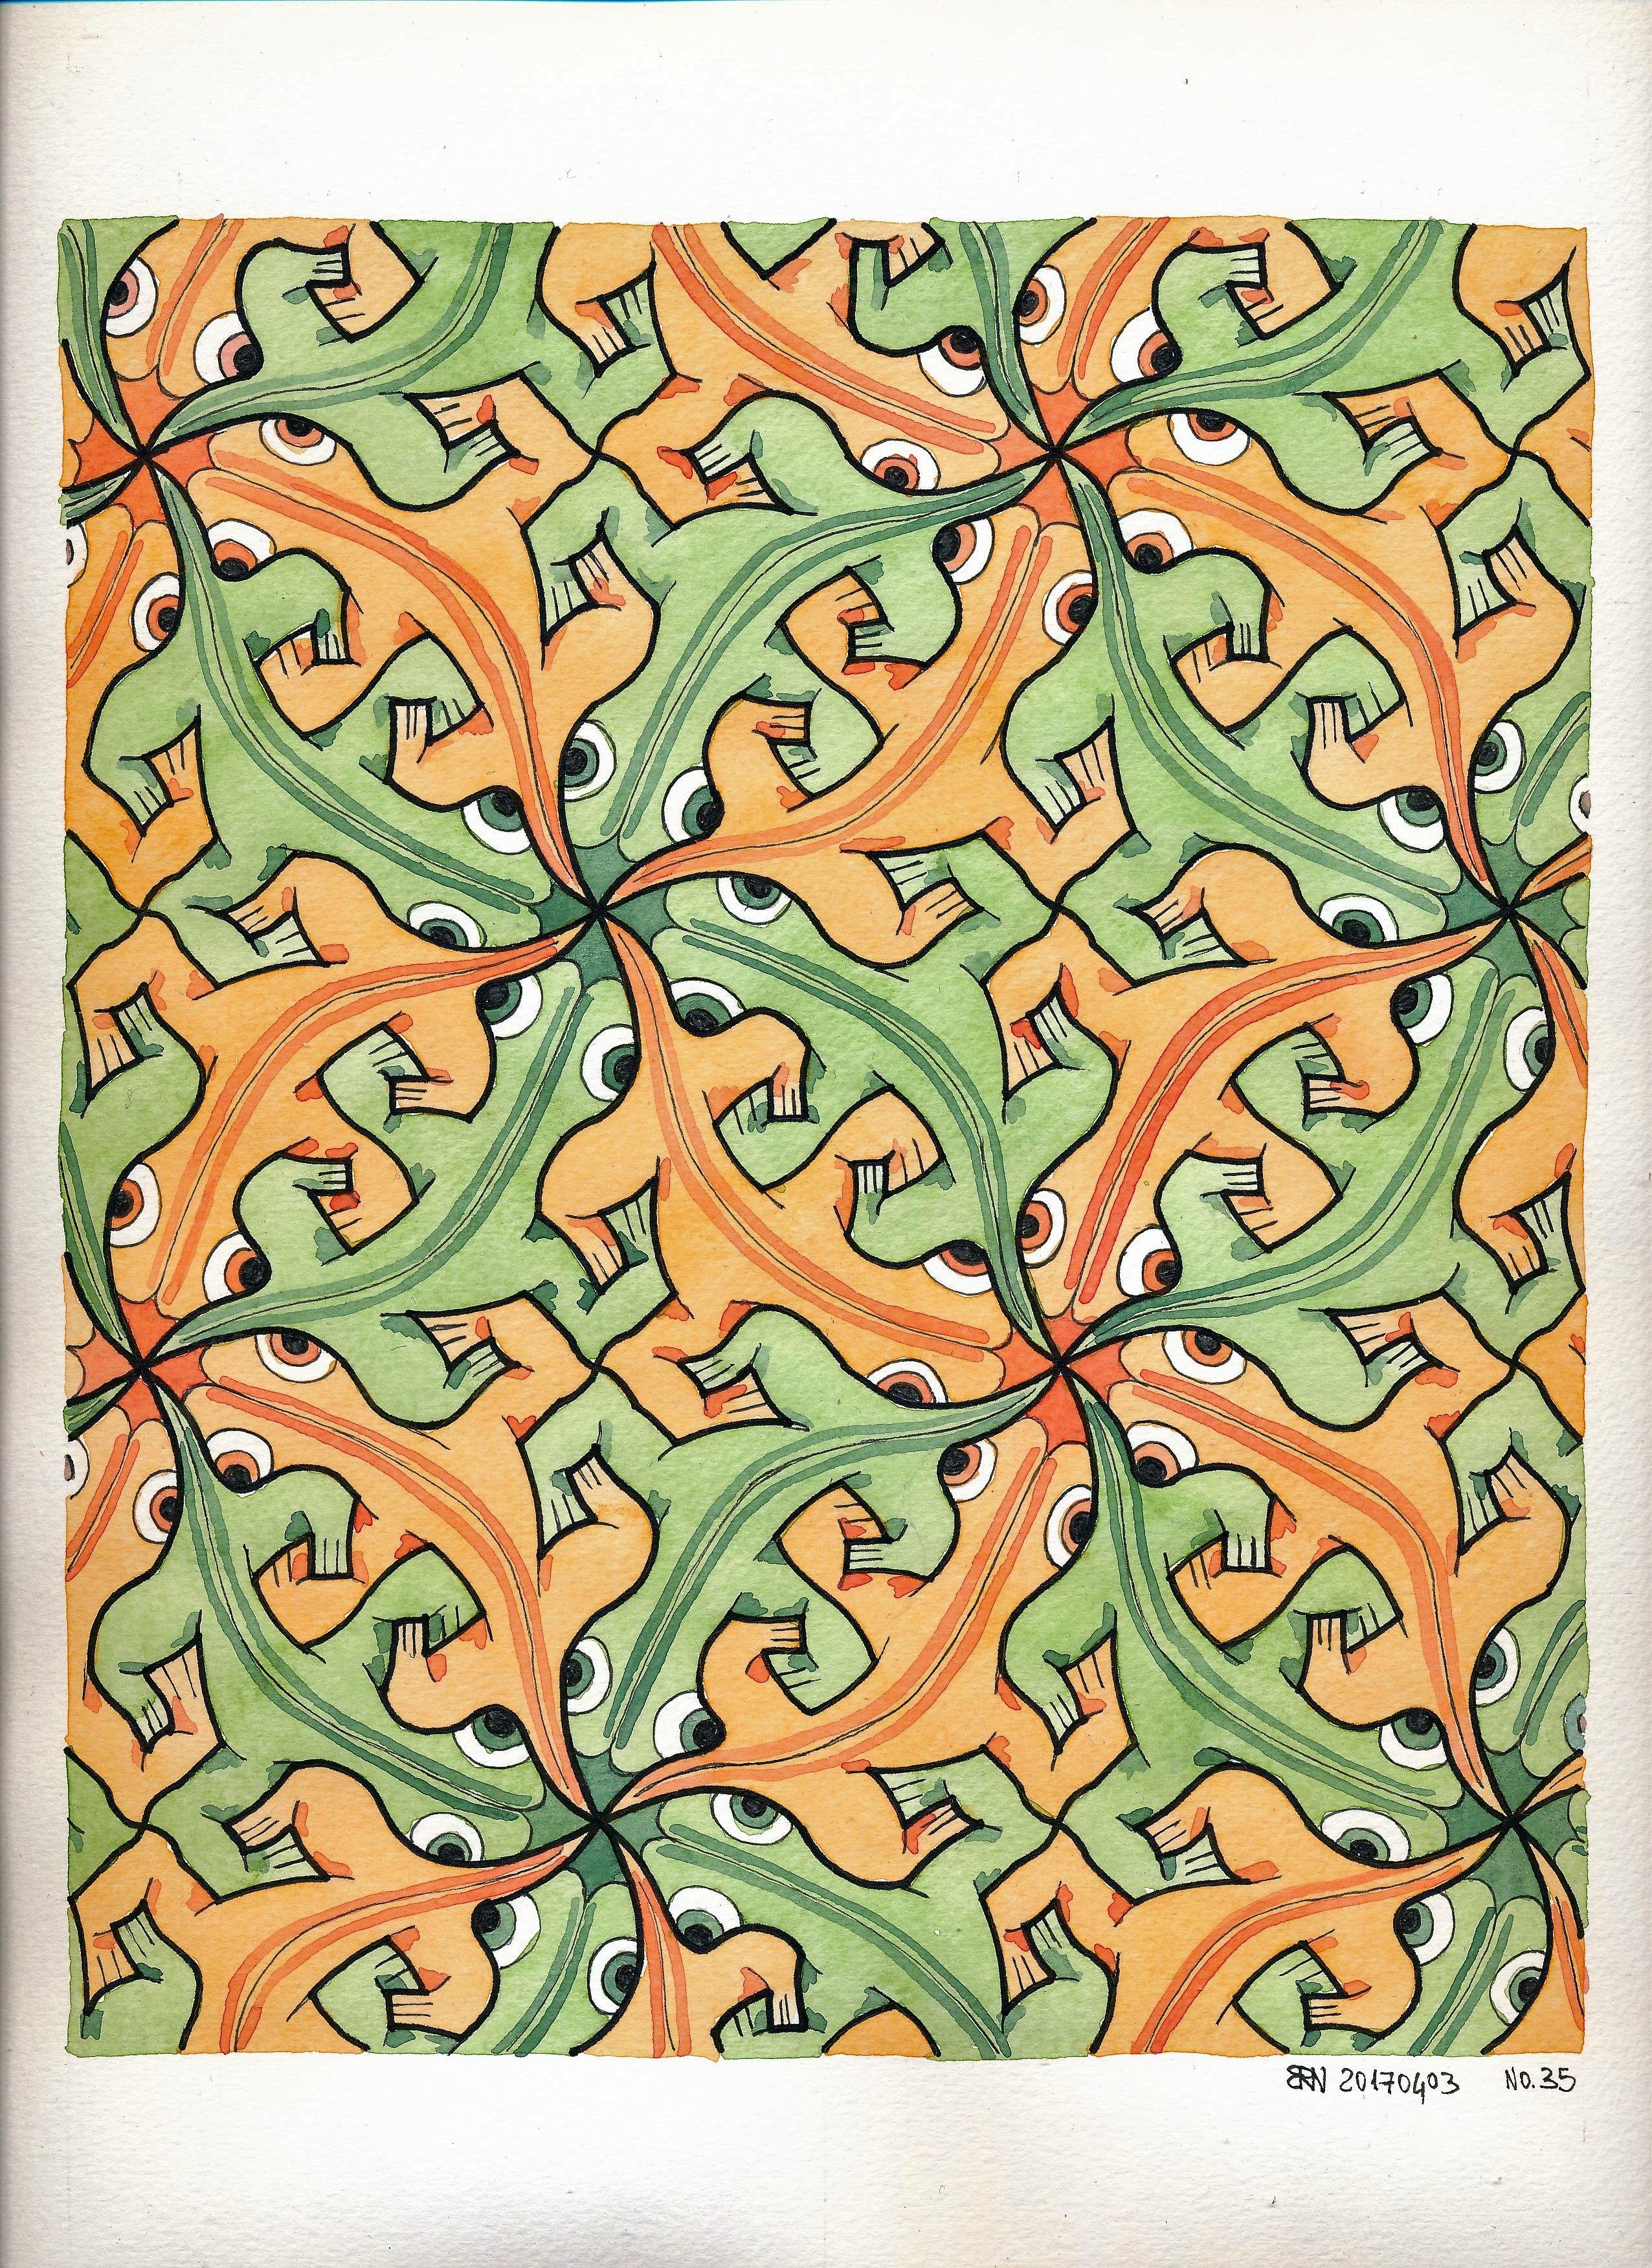 Escher tessellations birds visit m c escher tessellations art mc escher geometry pattern cornelius reptiles coloring pages lizards doublecrazyfo Images